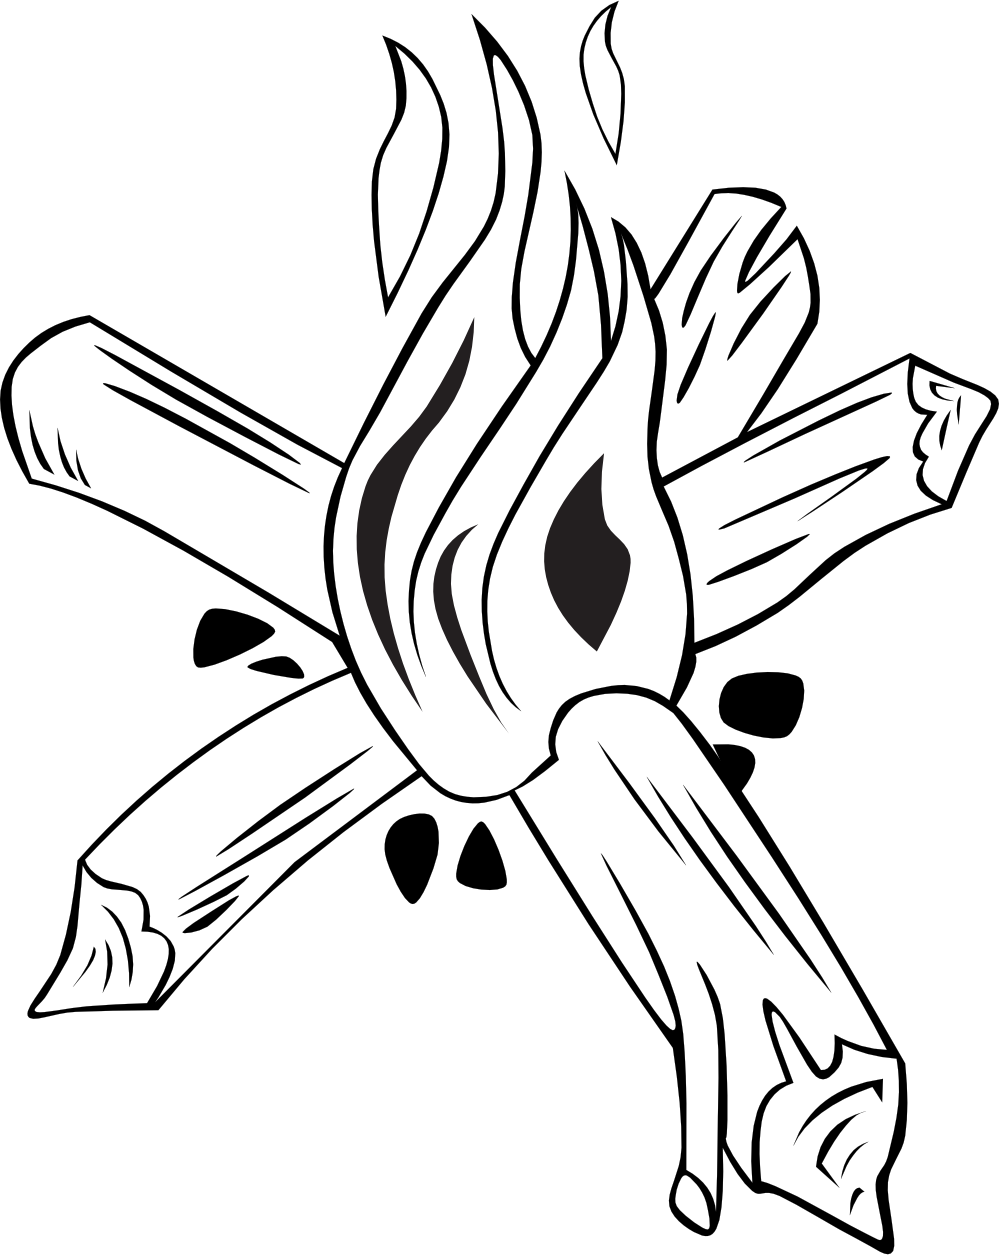 Winter clipart bonfire. Campfire cooking panda free